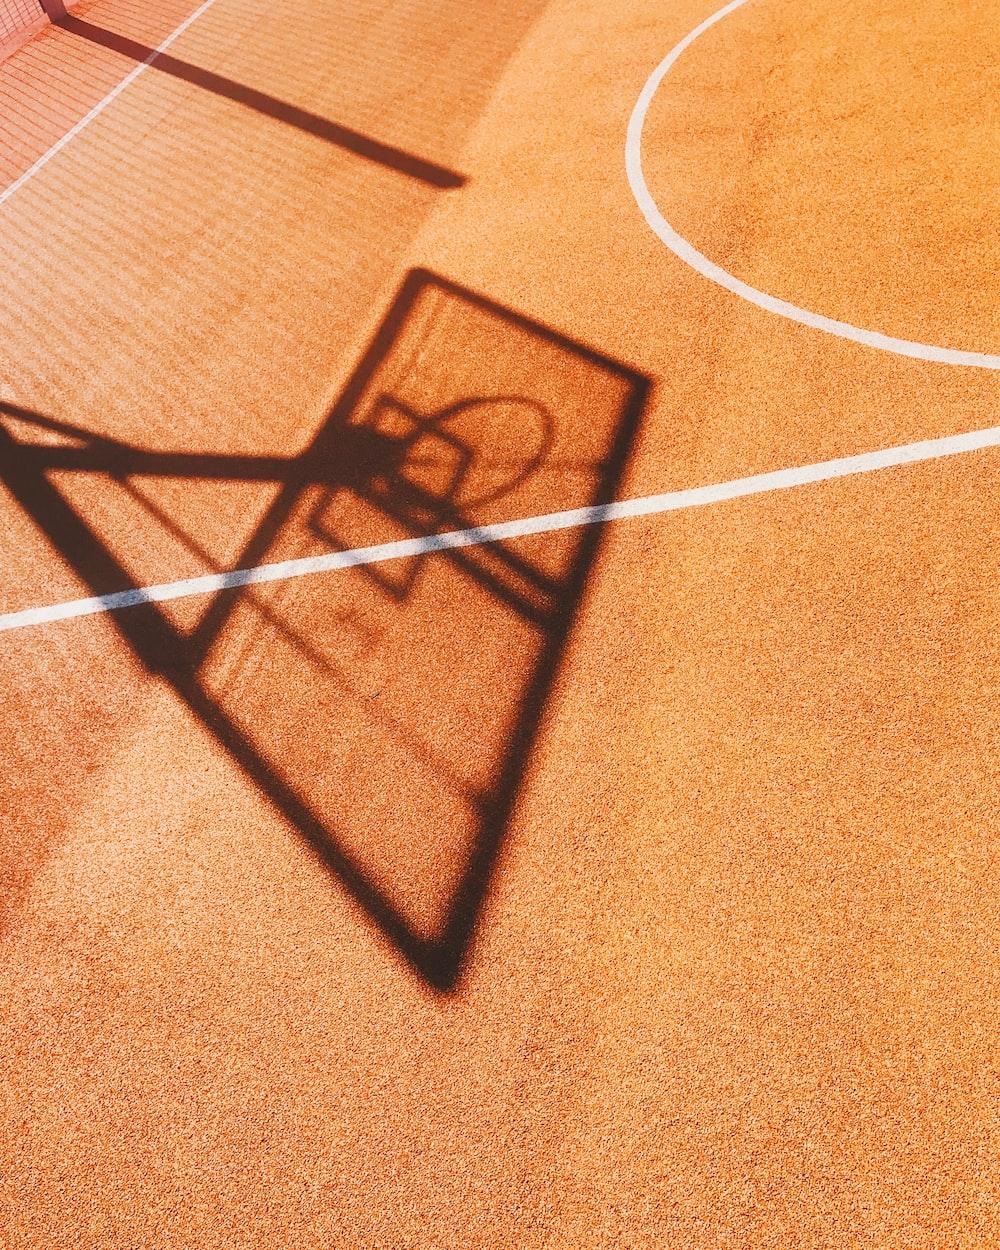 shadow of basketball hoop